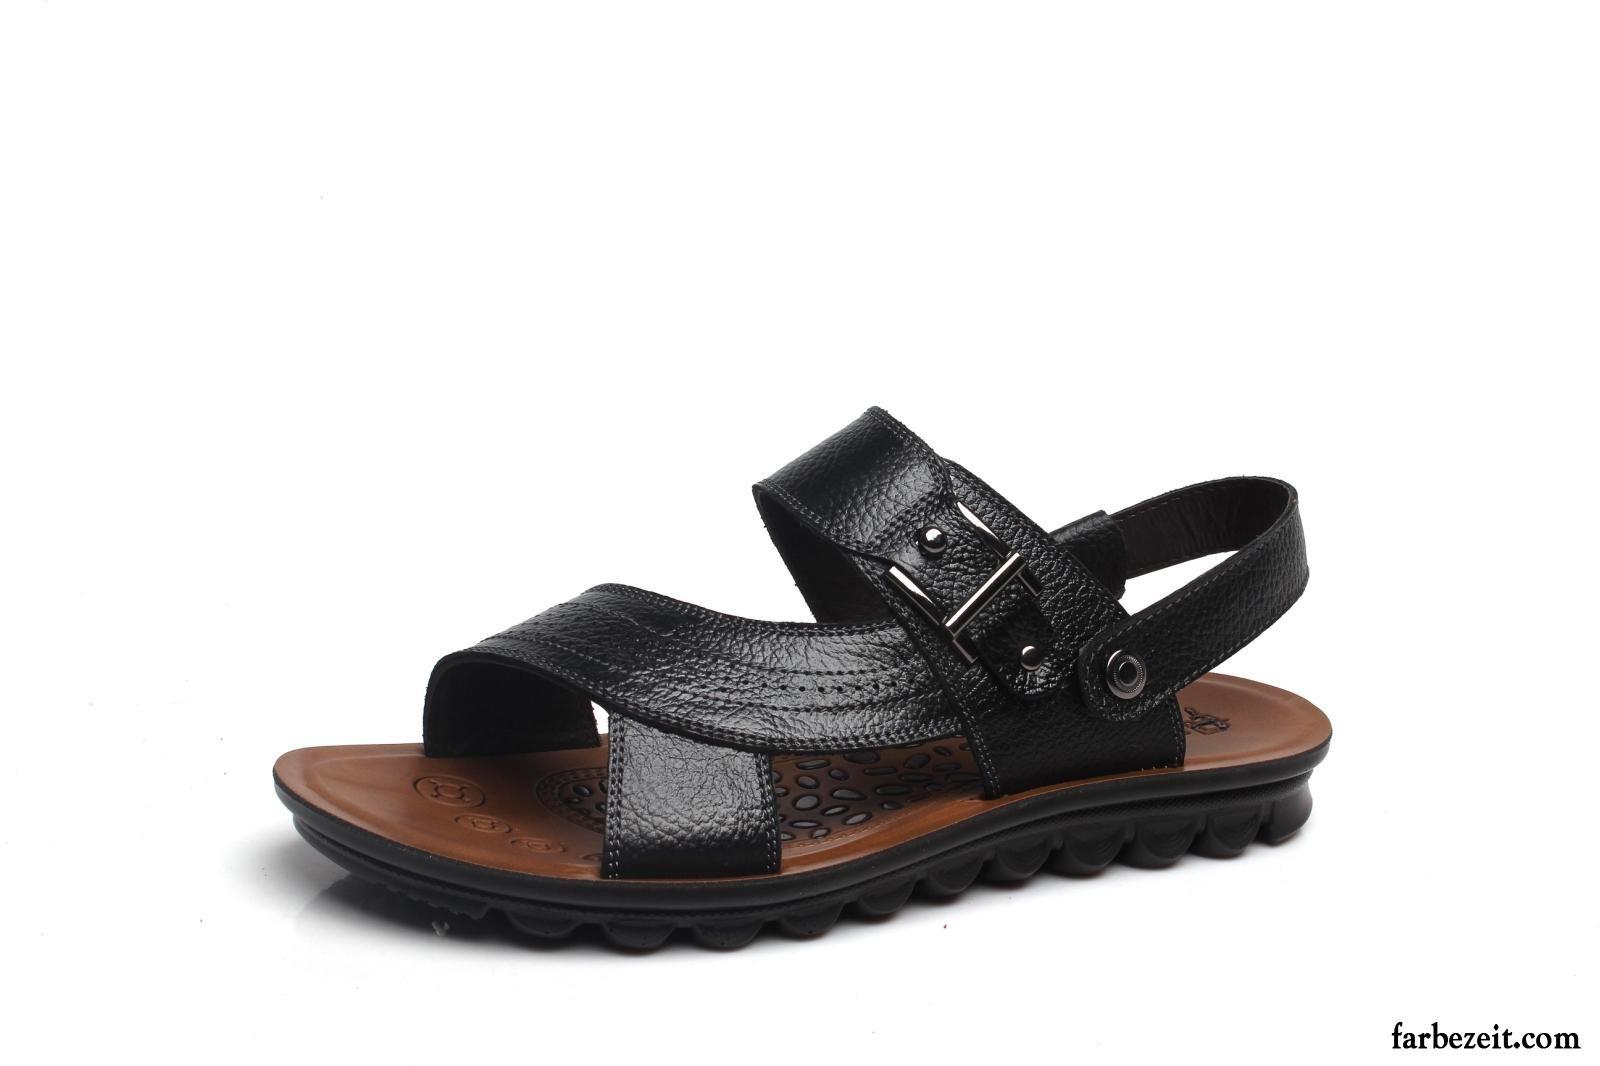 Schuhe Herren Blau Kostenloser Versand Pantolette Marke Leder